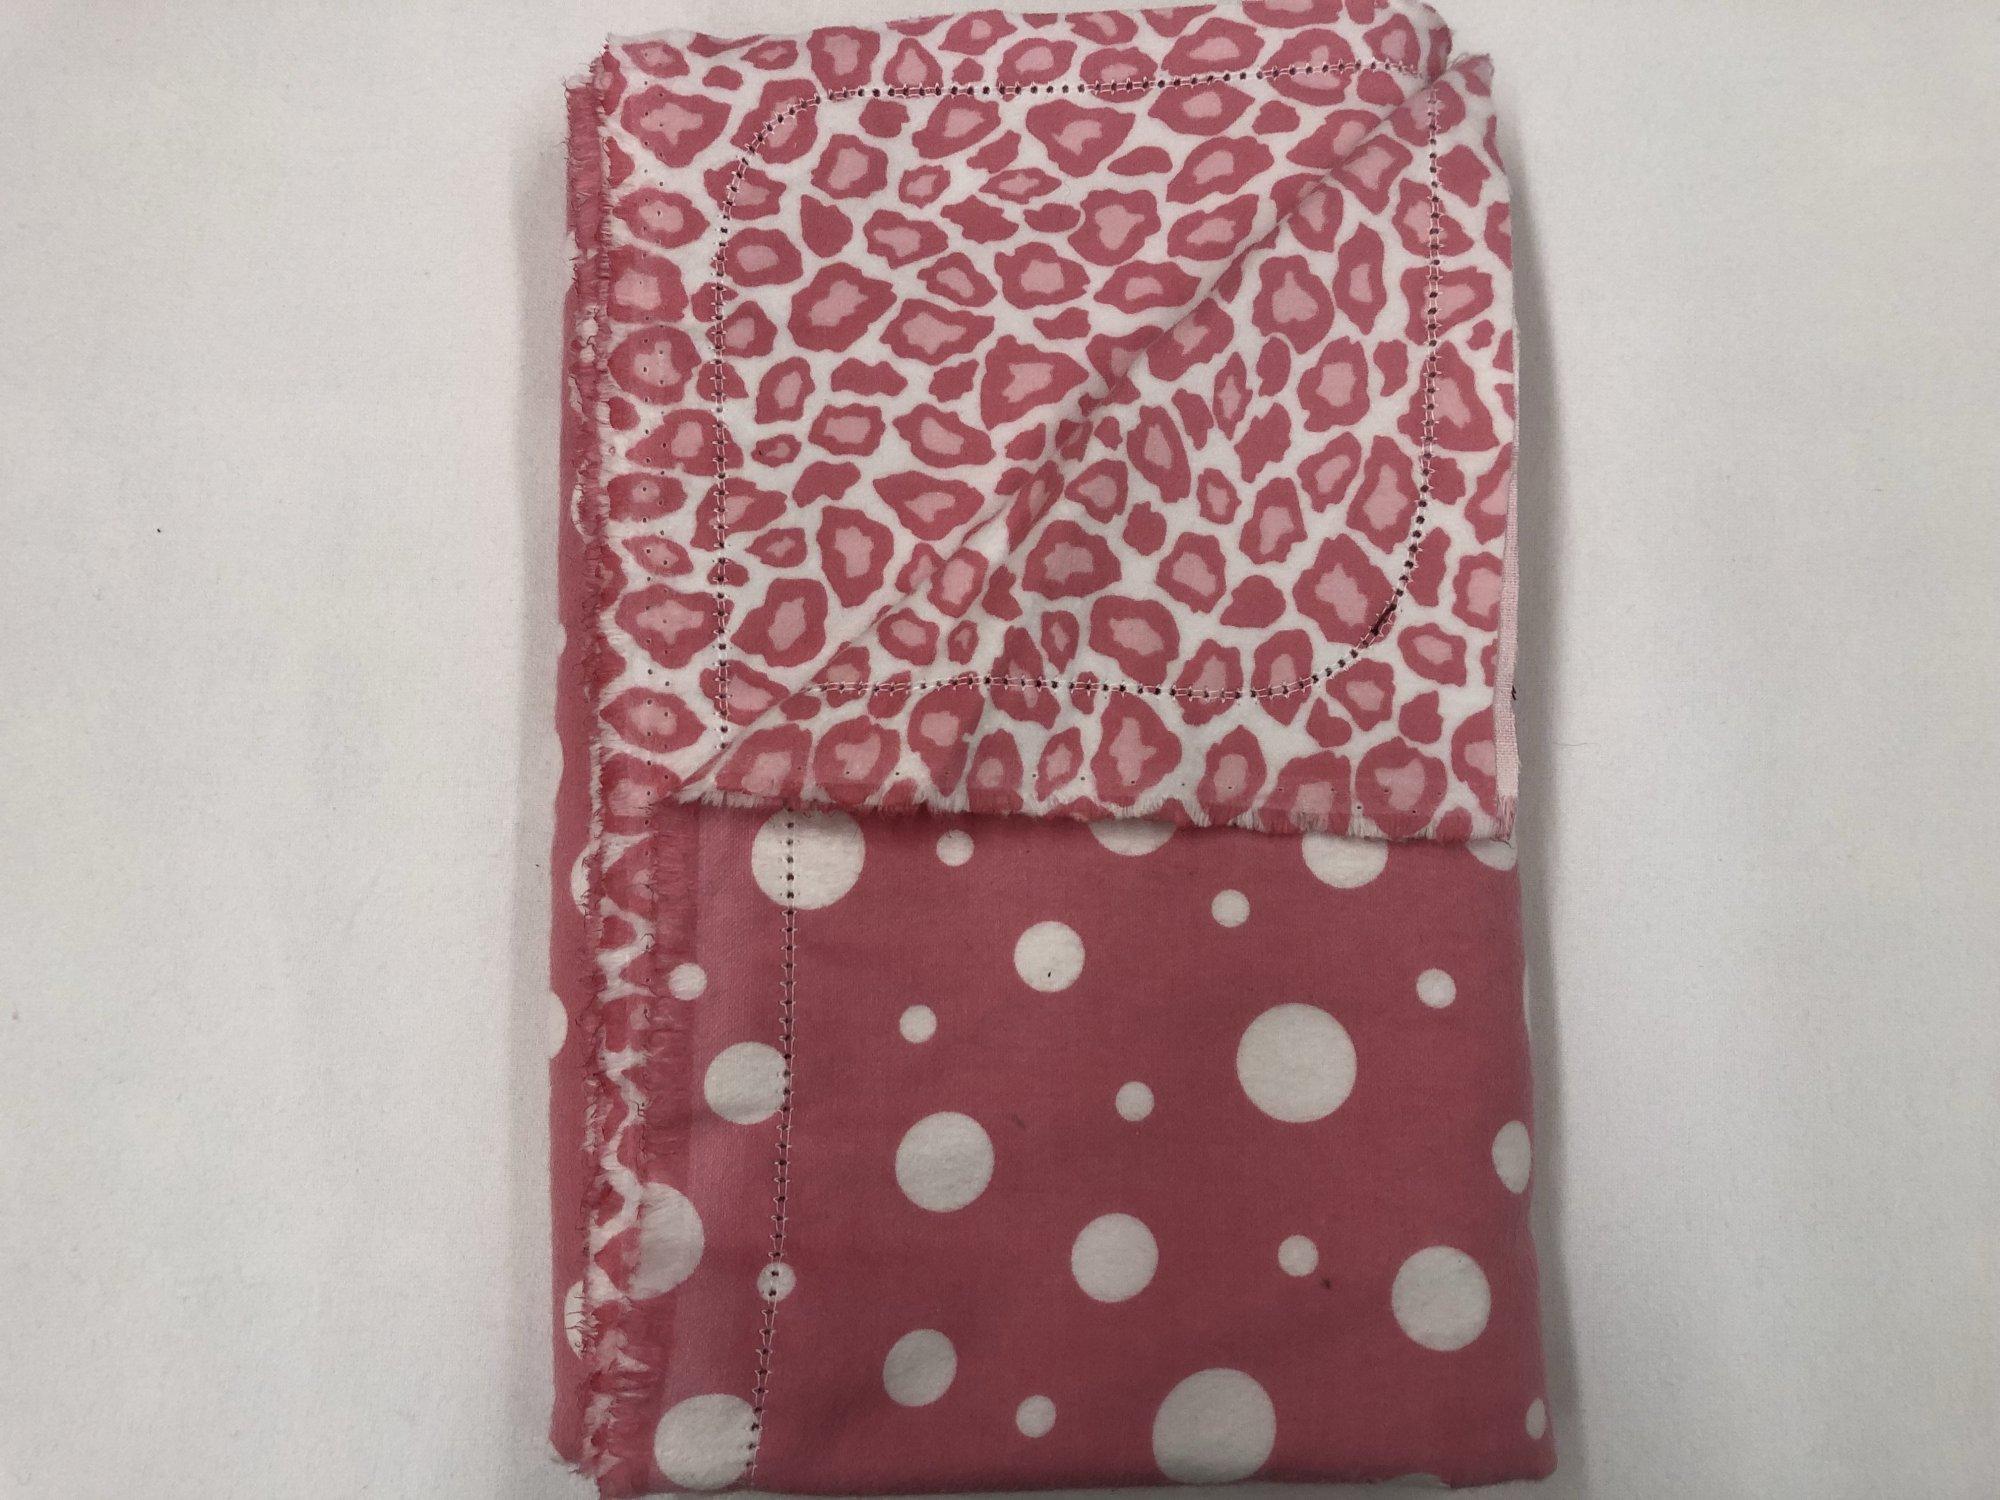 Large white polkadots on pink background/pink cheetah pattern on white background